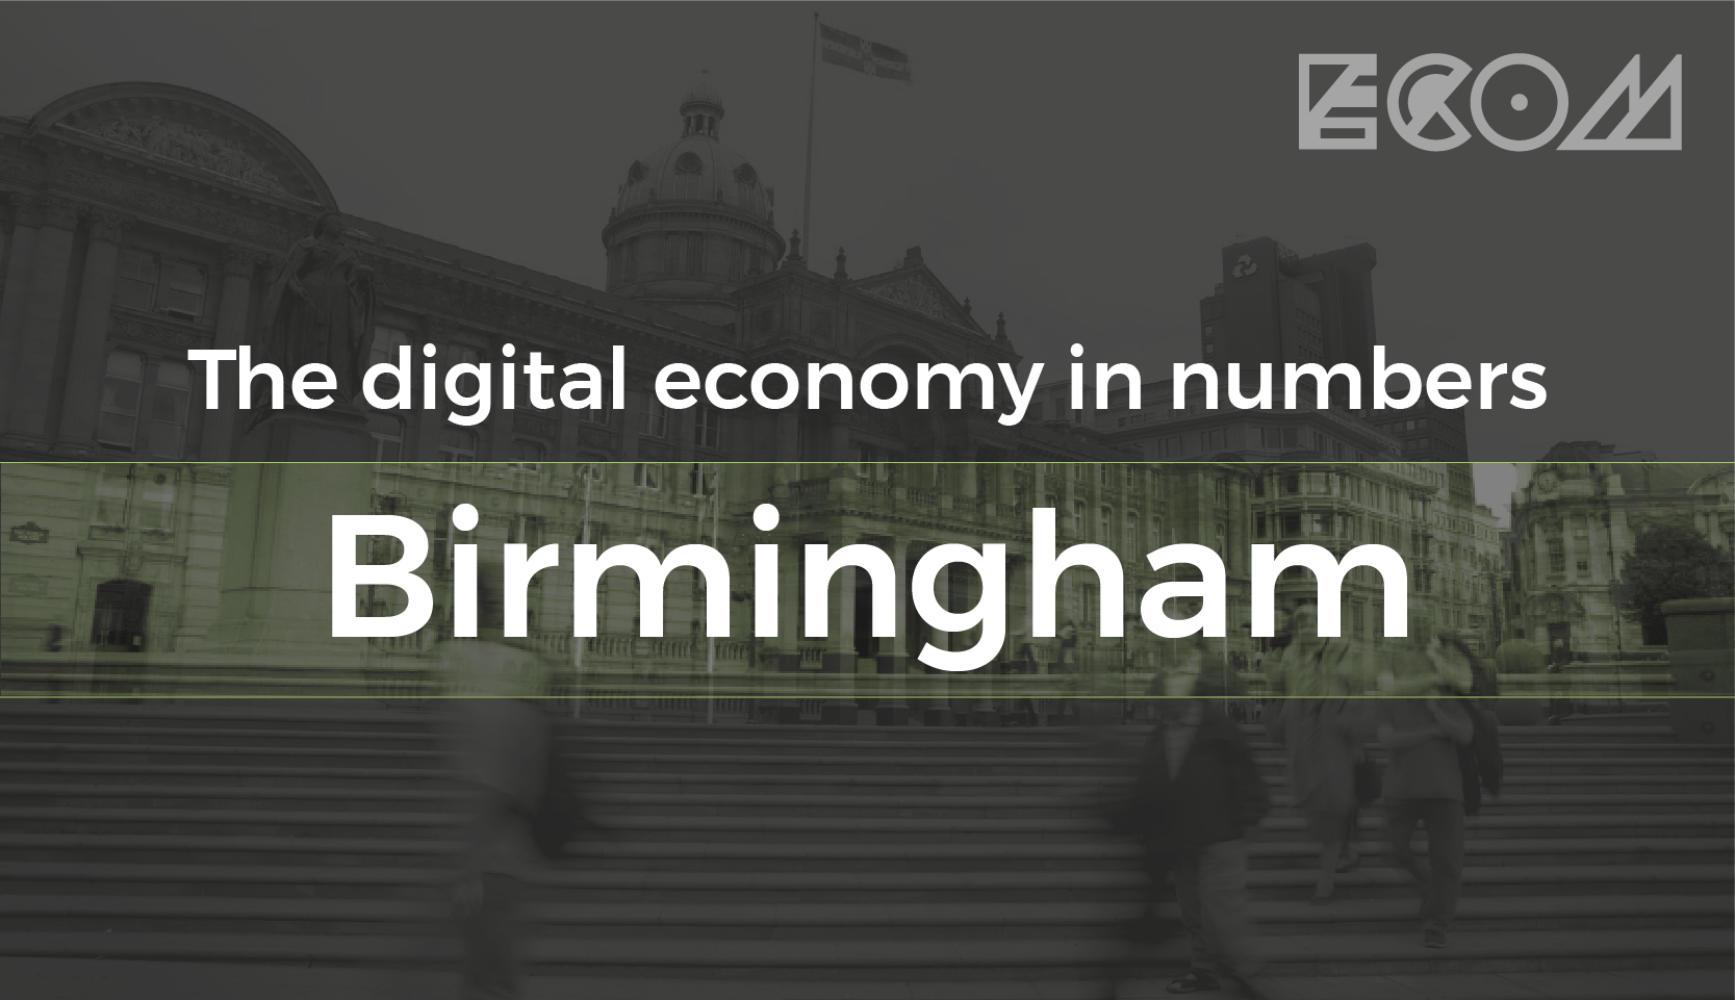 Birmingham Digital Economy Infographic Thumbnail